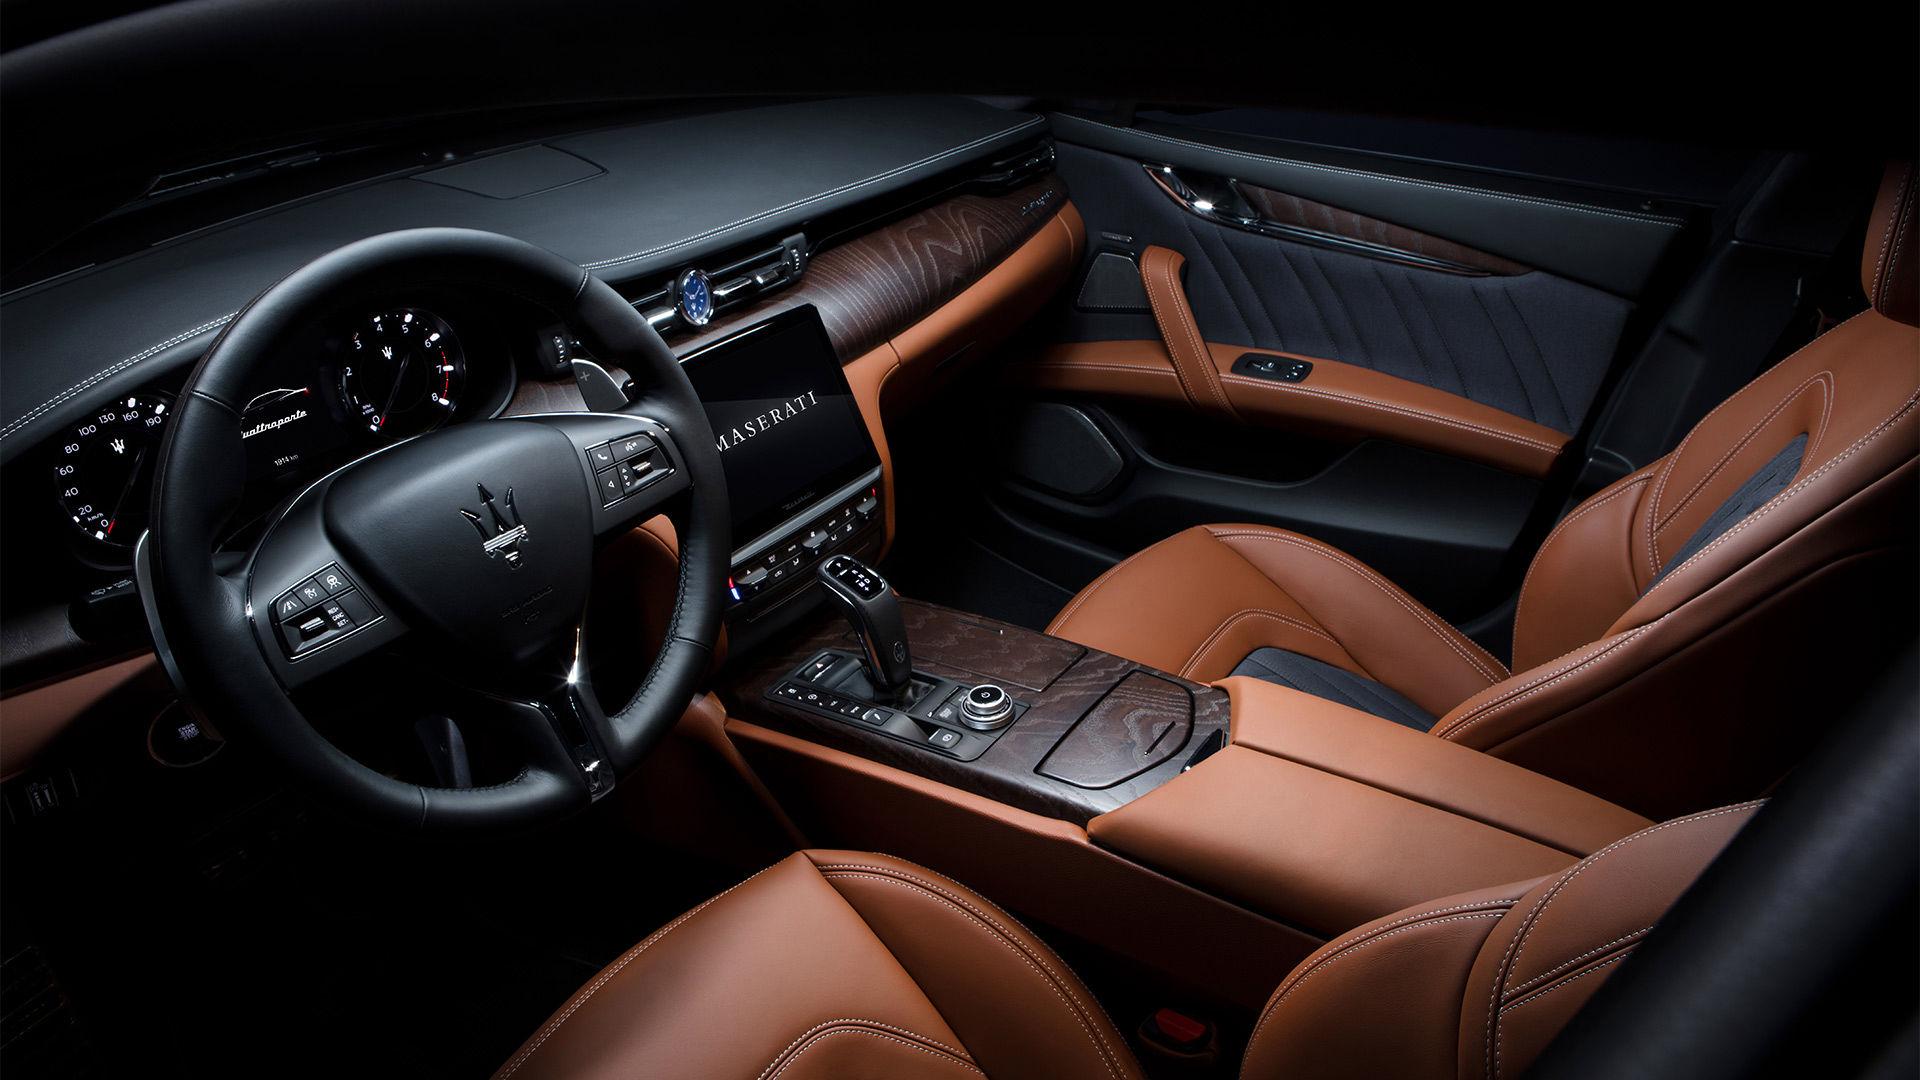 Maserati Quattroporte Interieur: Ledersitze und Cockpit